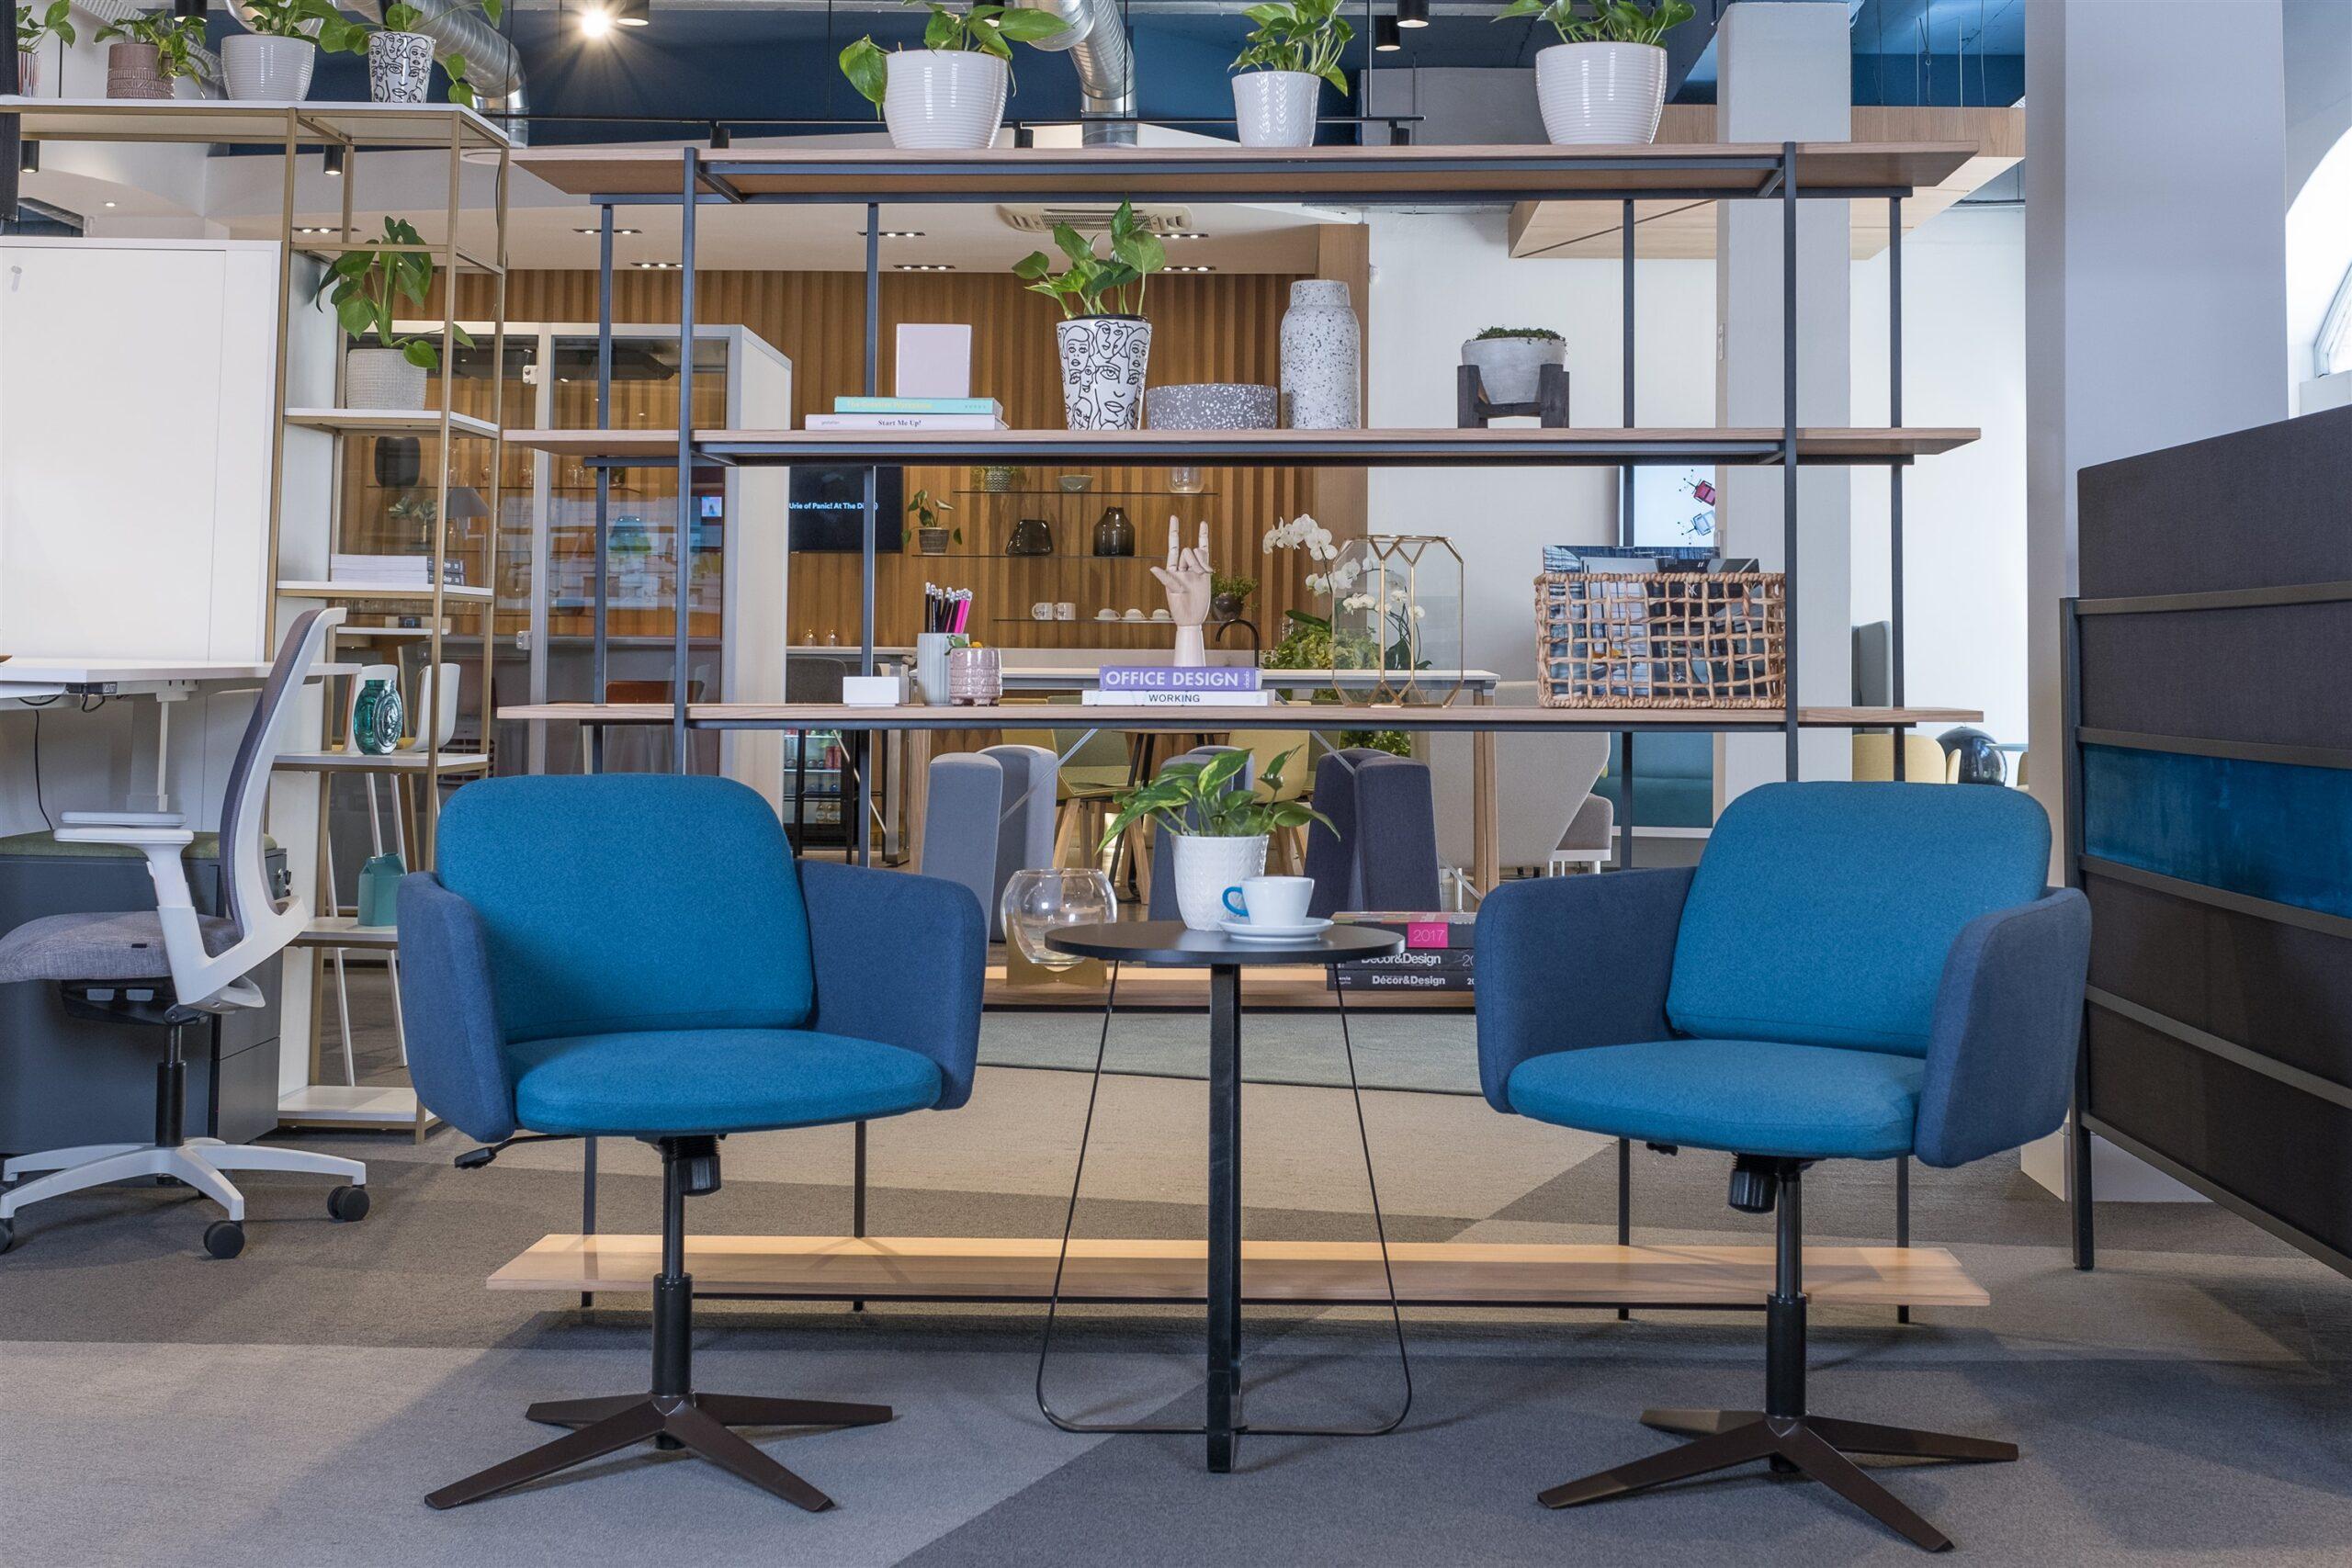 AngelShack: Global Design And Innovation